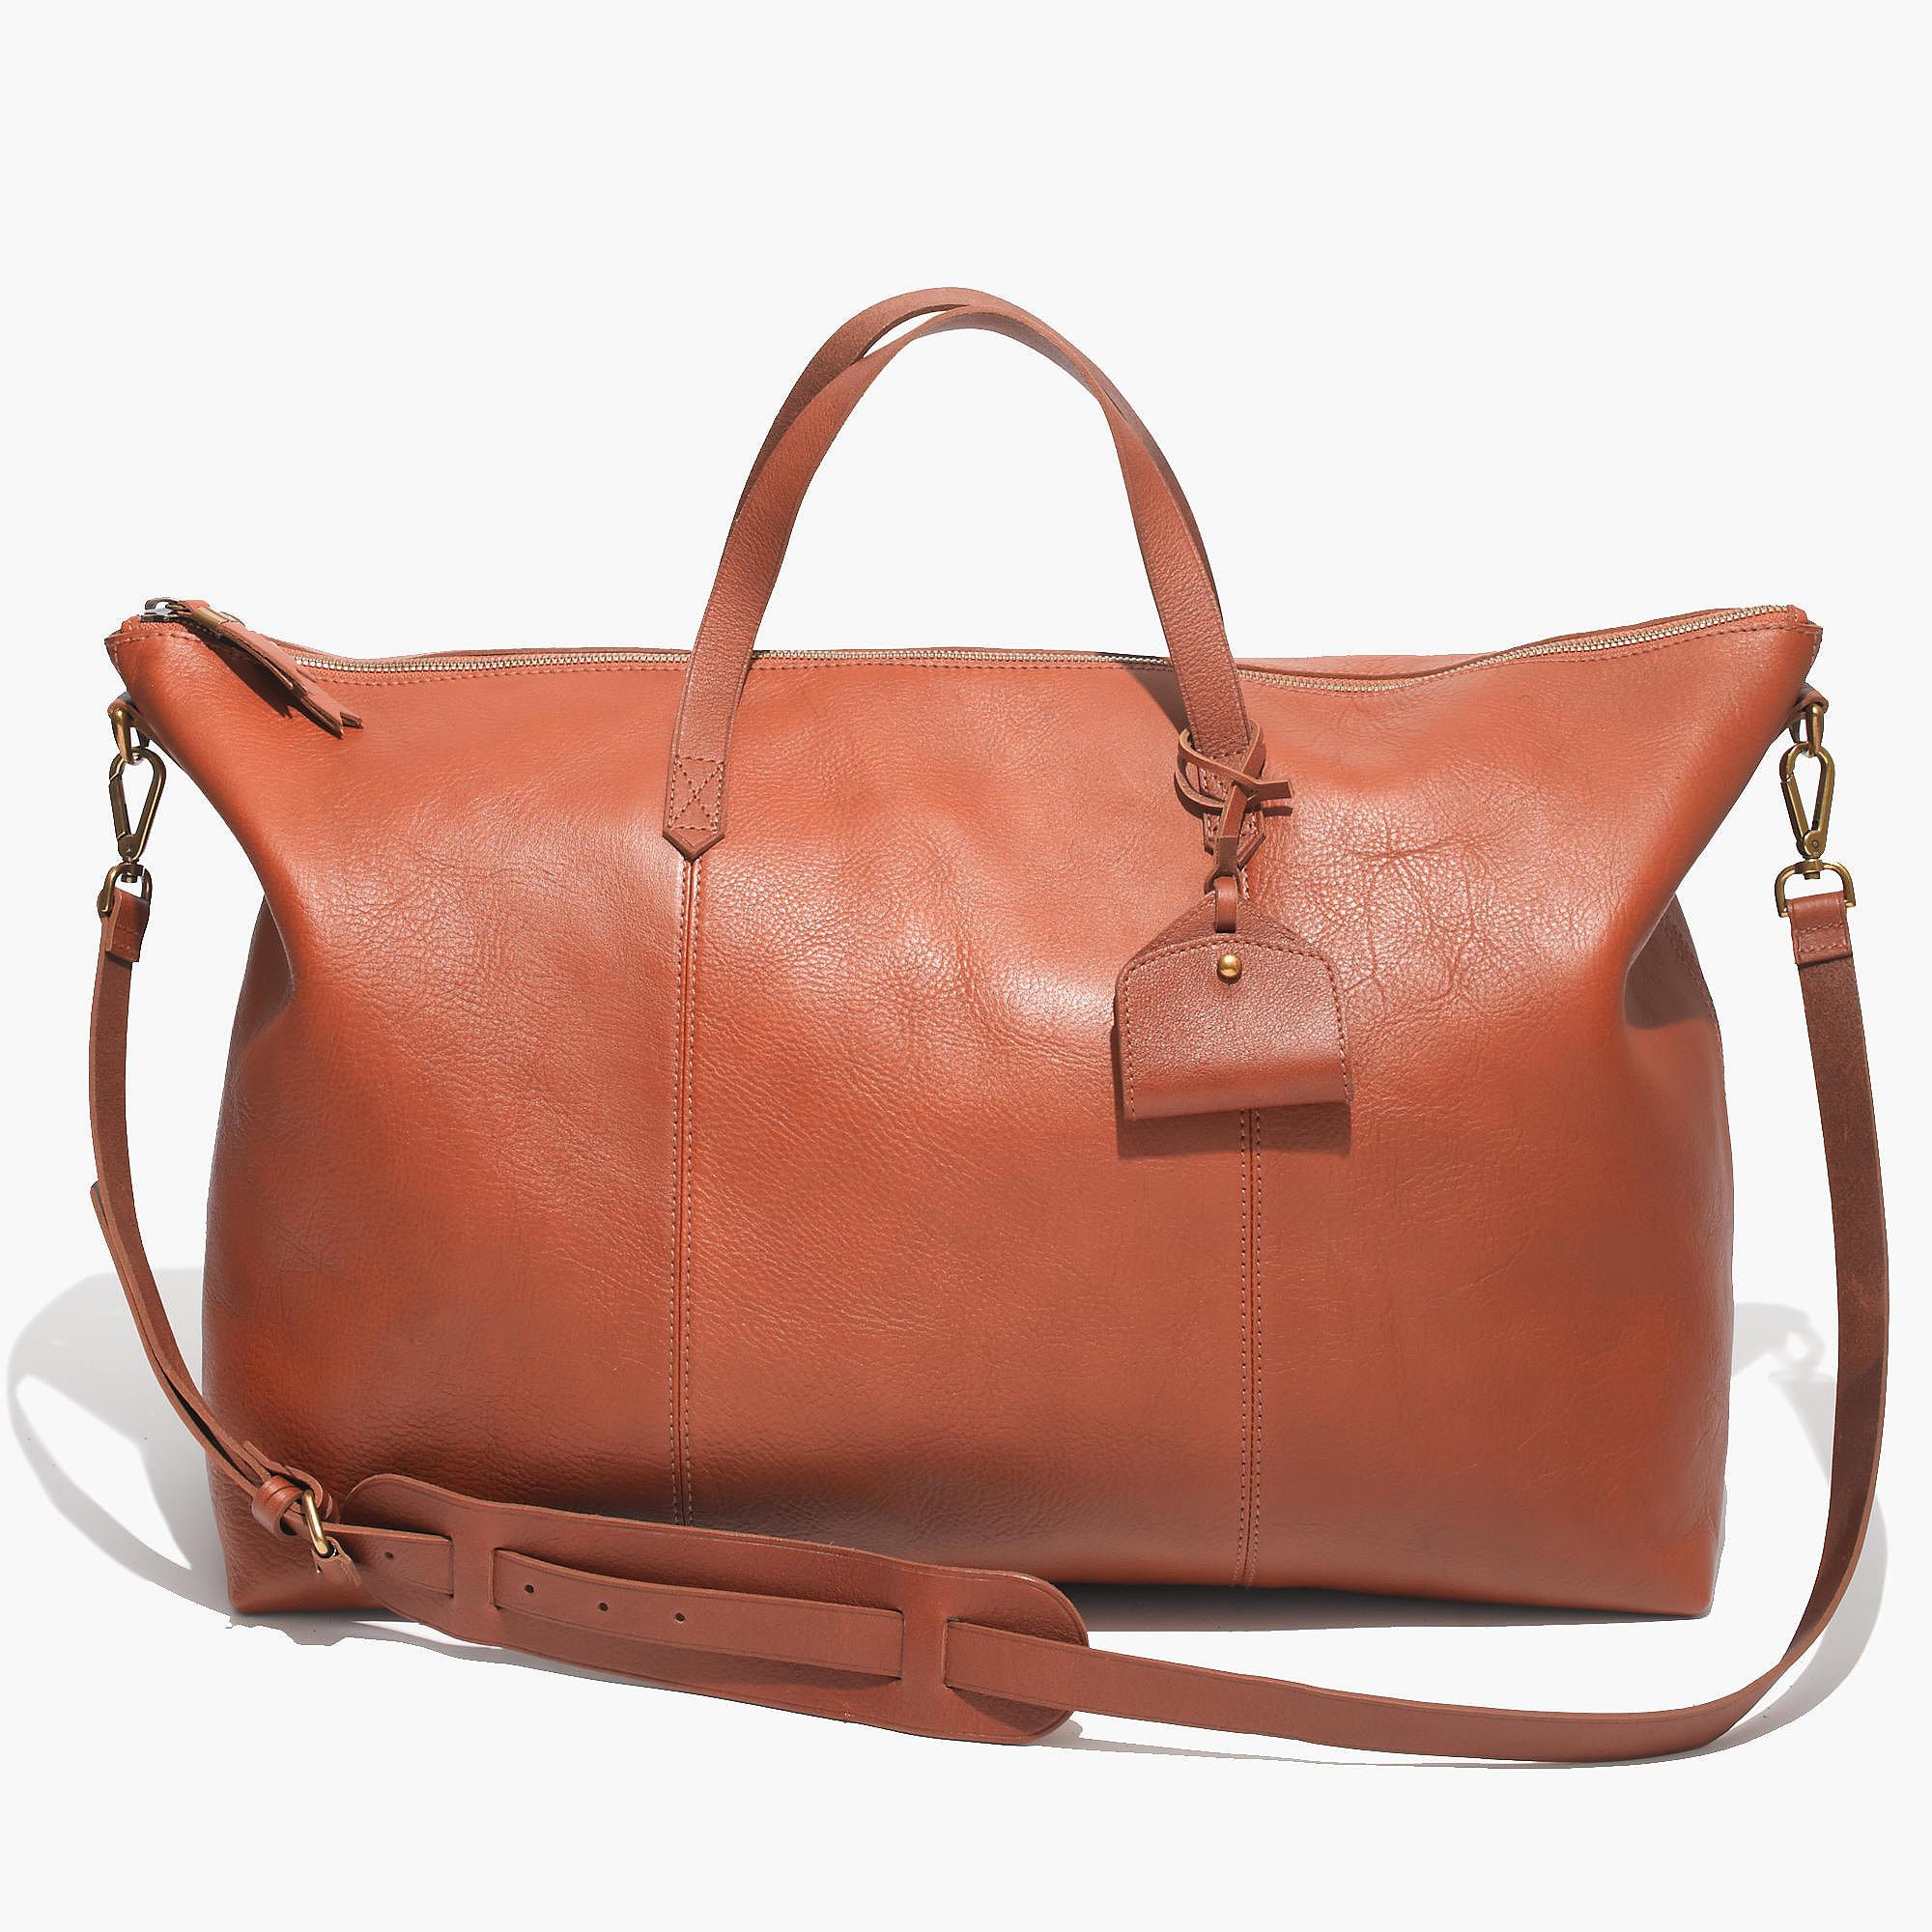 Madewell Leather Weekend Bag